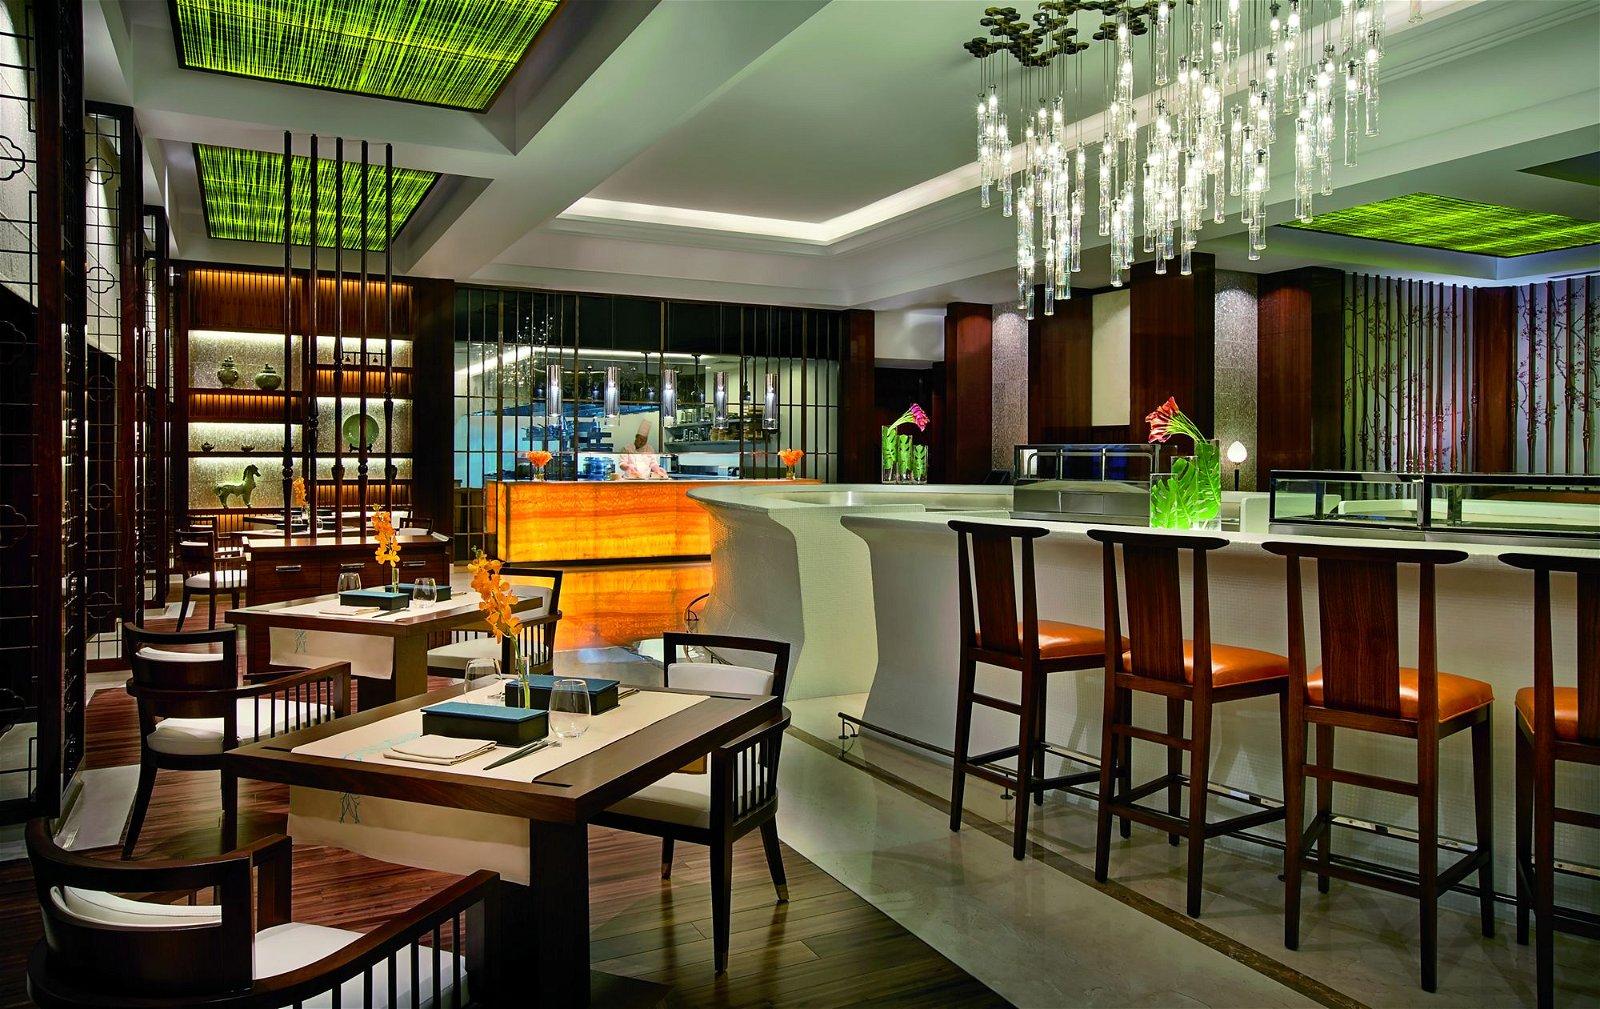 صورة مطعم بلو جيد في مرسى دبي